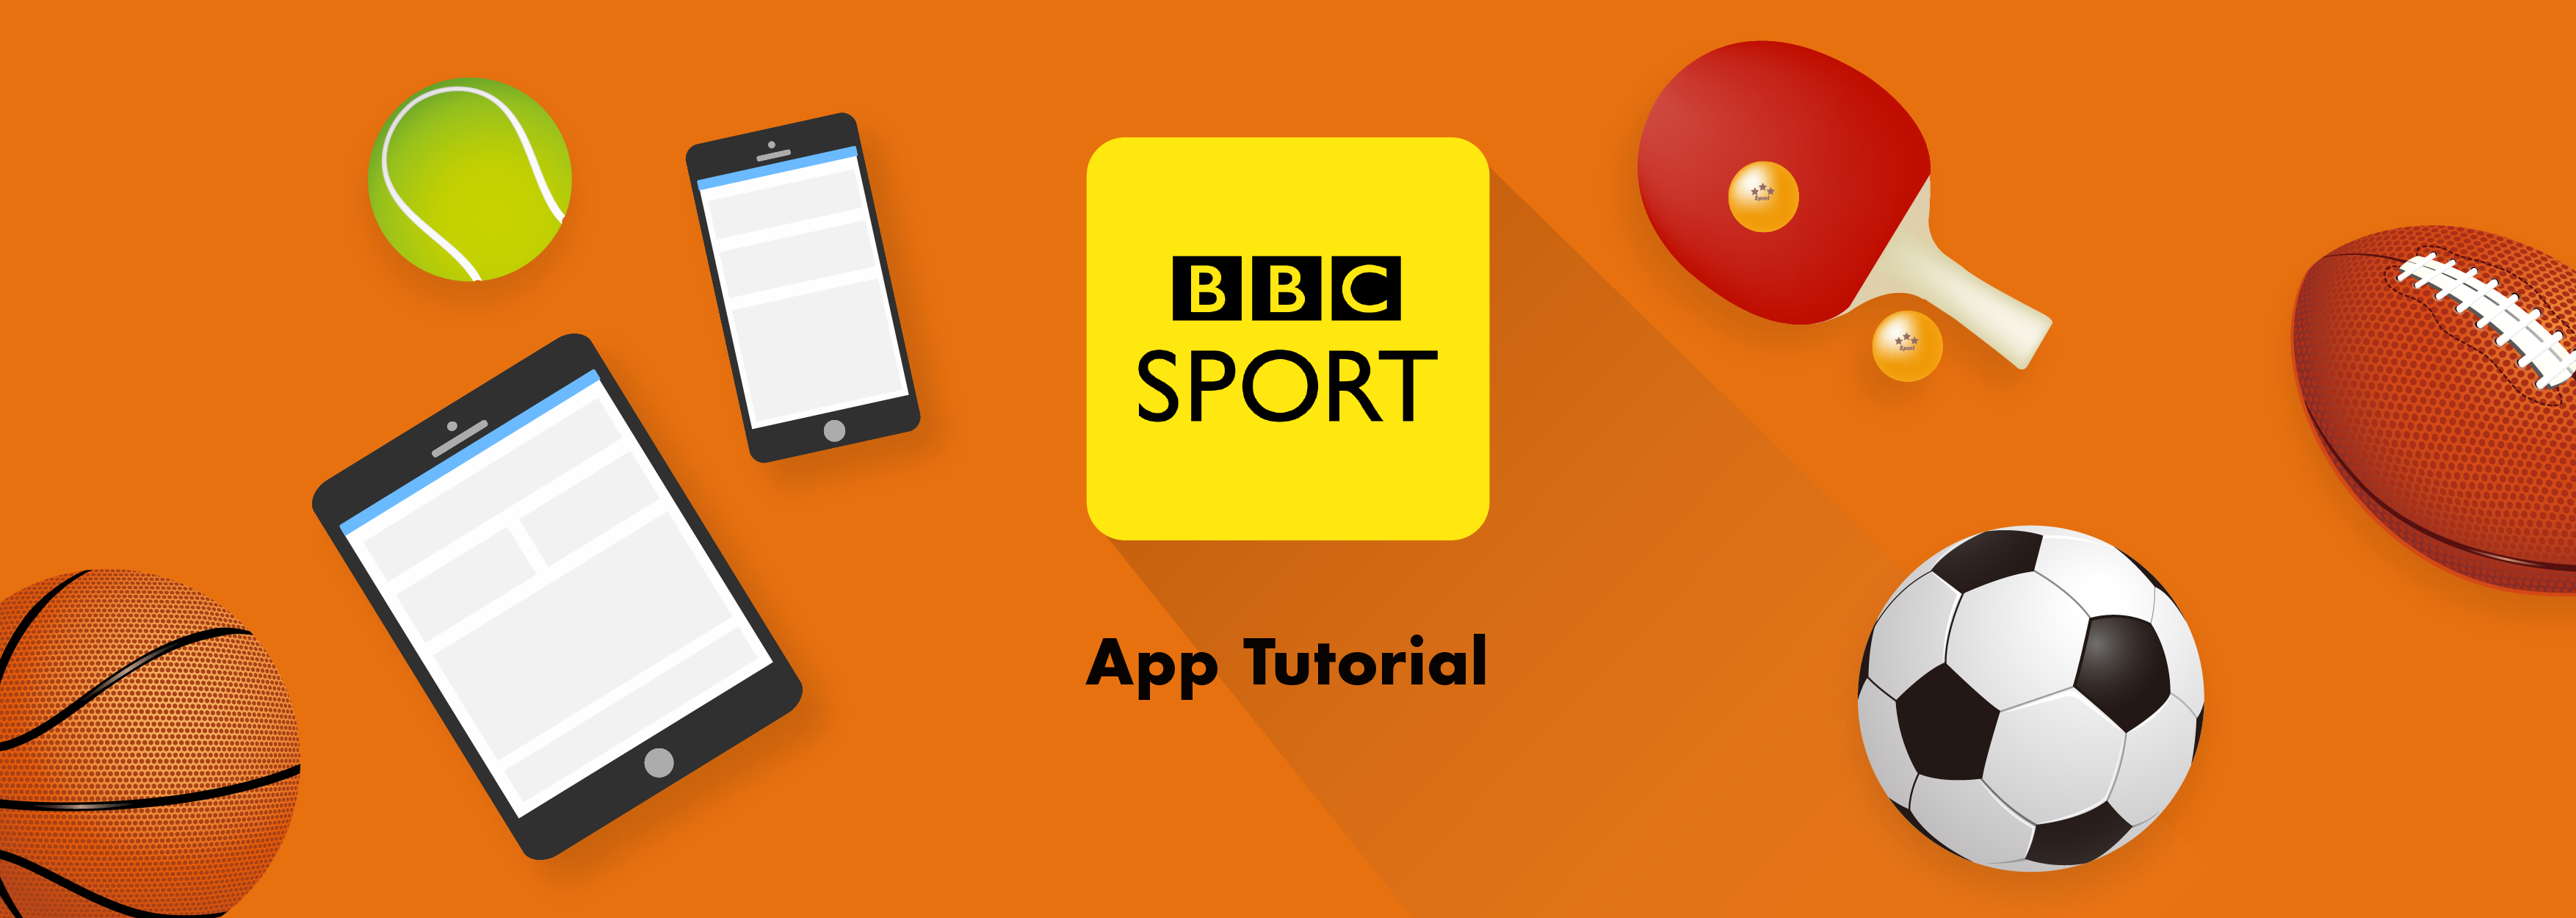 bbc sport app free